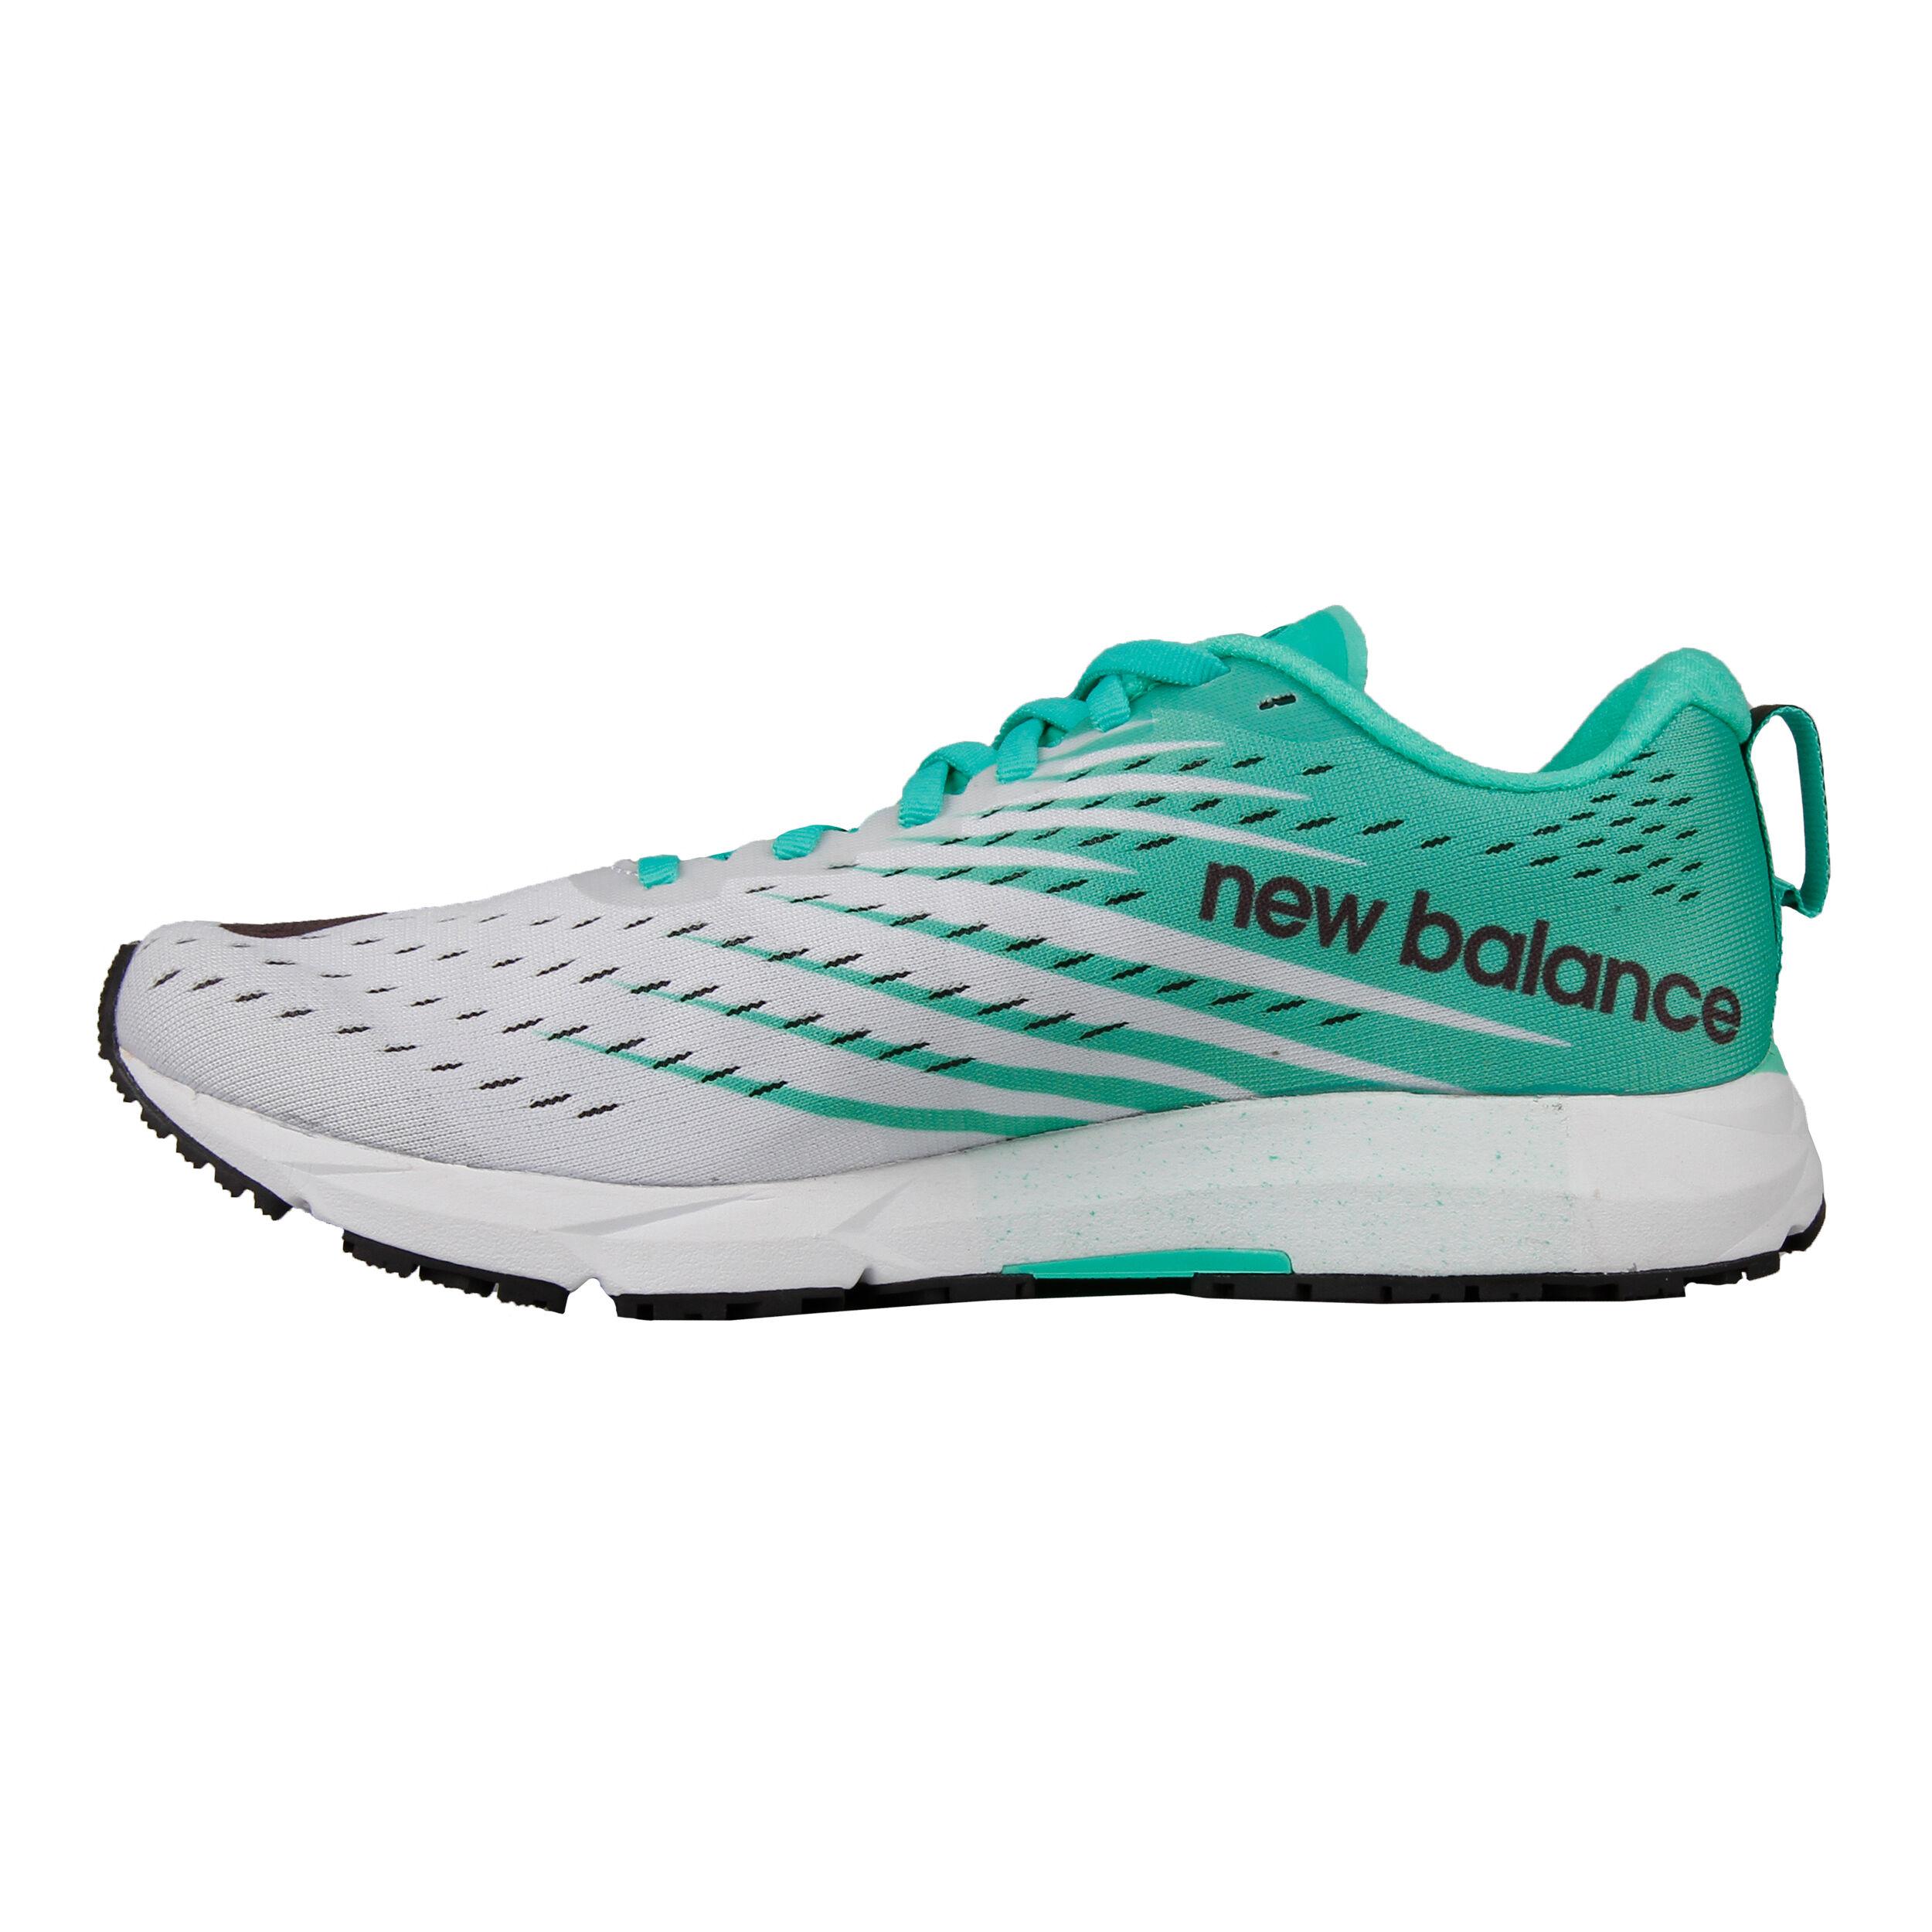 new balance 1500 v5